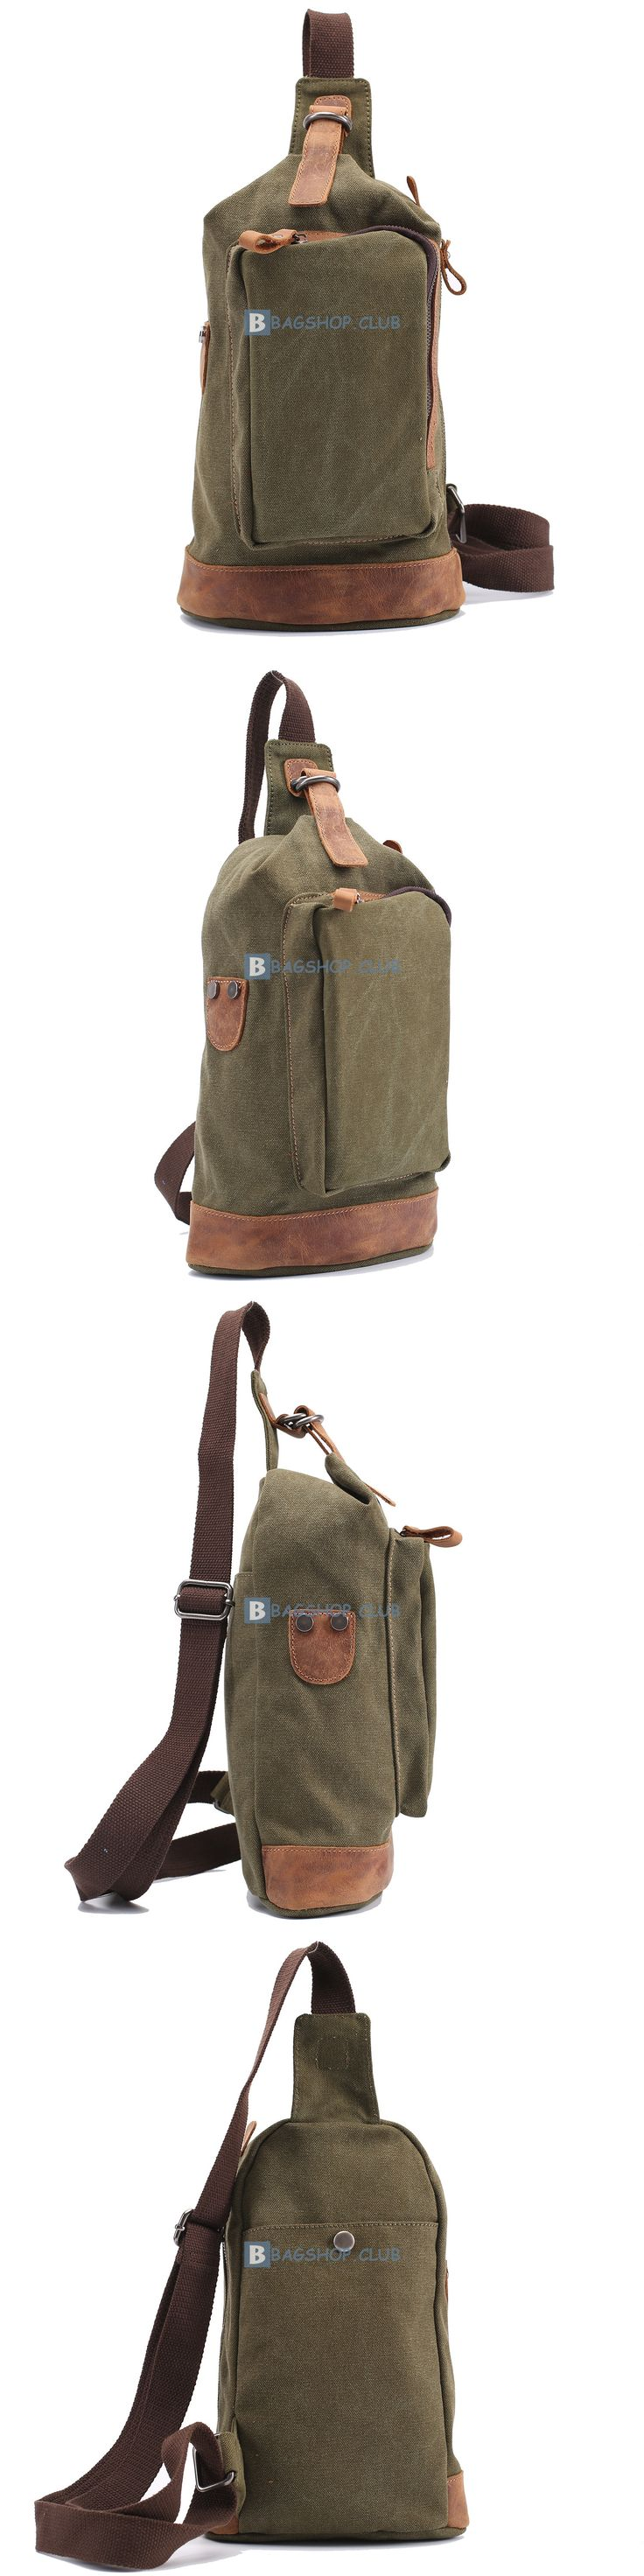 Canvas Sling Bags For Men Single Strap Backpacks